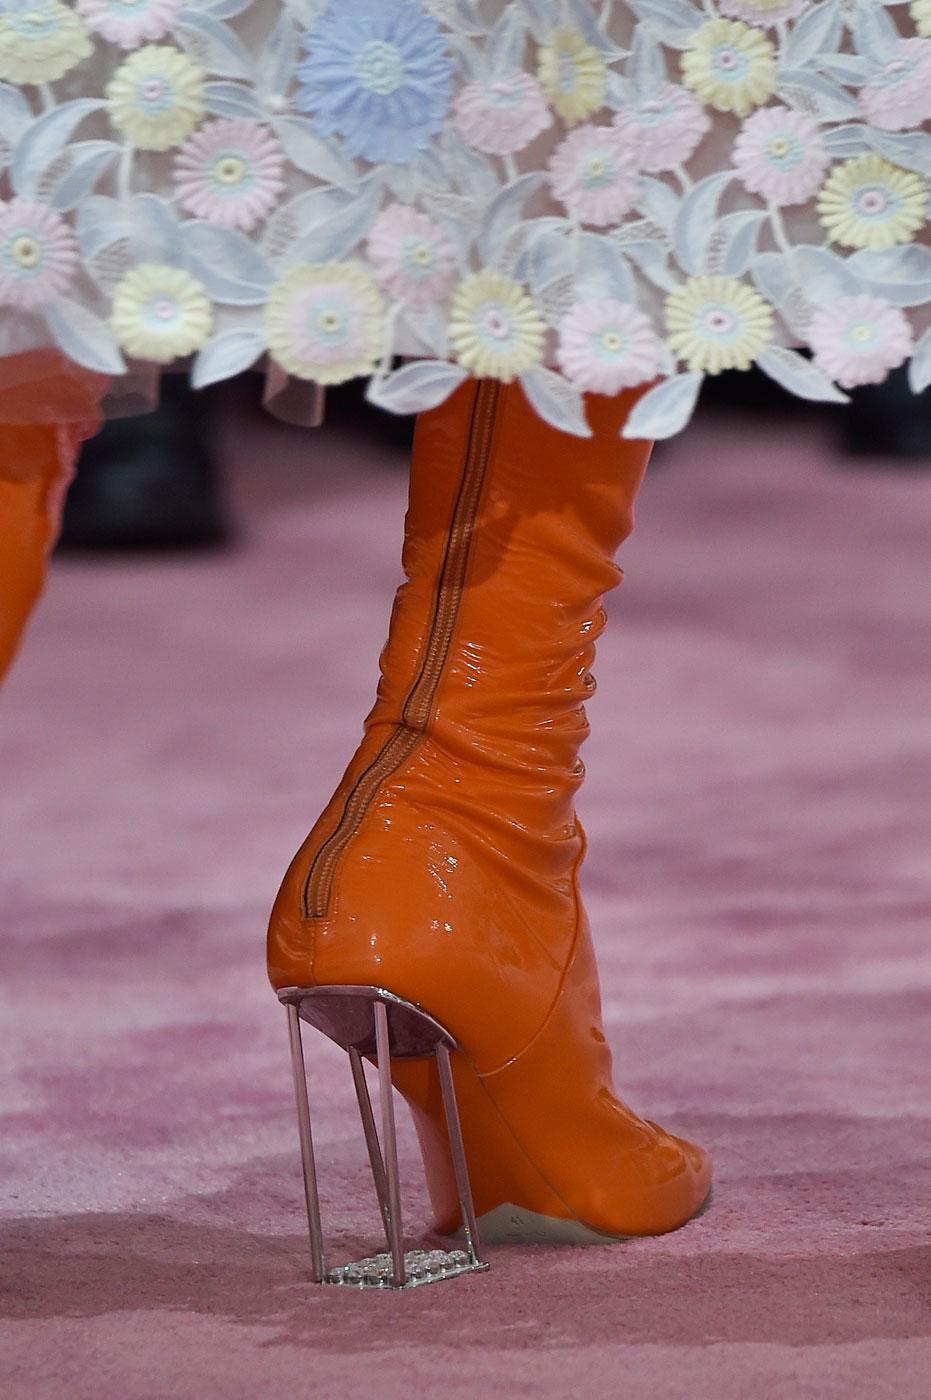 Christian-Dior-fashion-runway-show-close-ups-haute-couture-paris-spring-summer-2015-the-impression-052